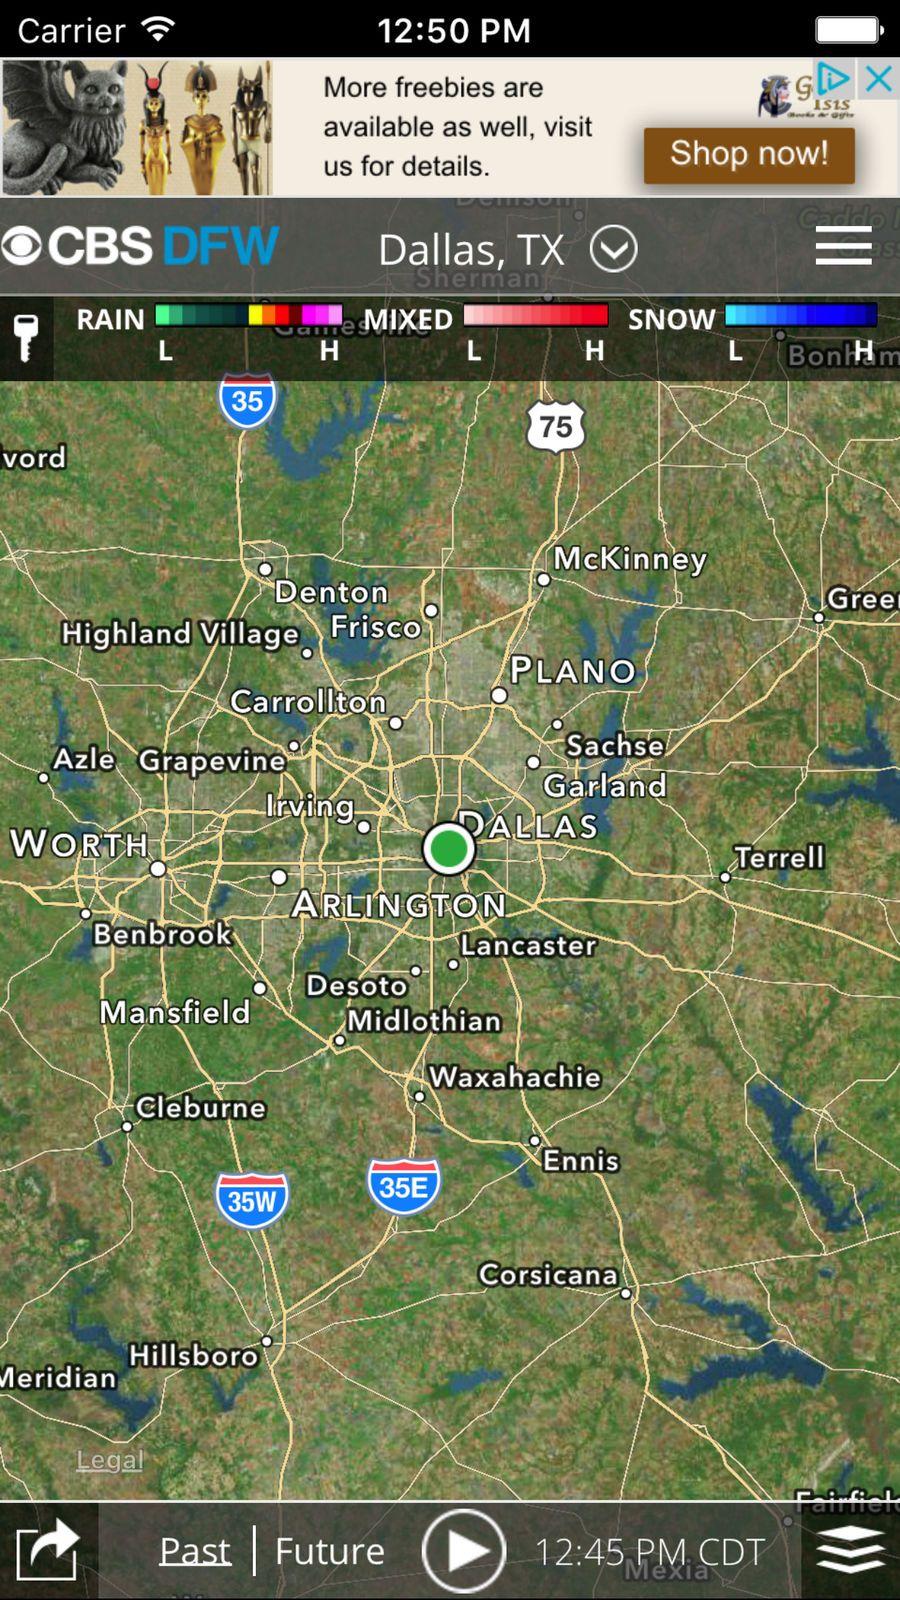 CBS DFW Weather #ios#apps#app#Local | Apple Game Cases